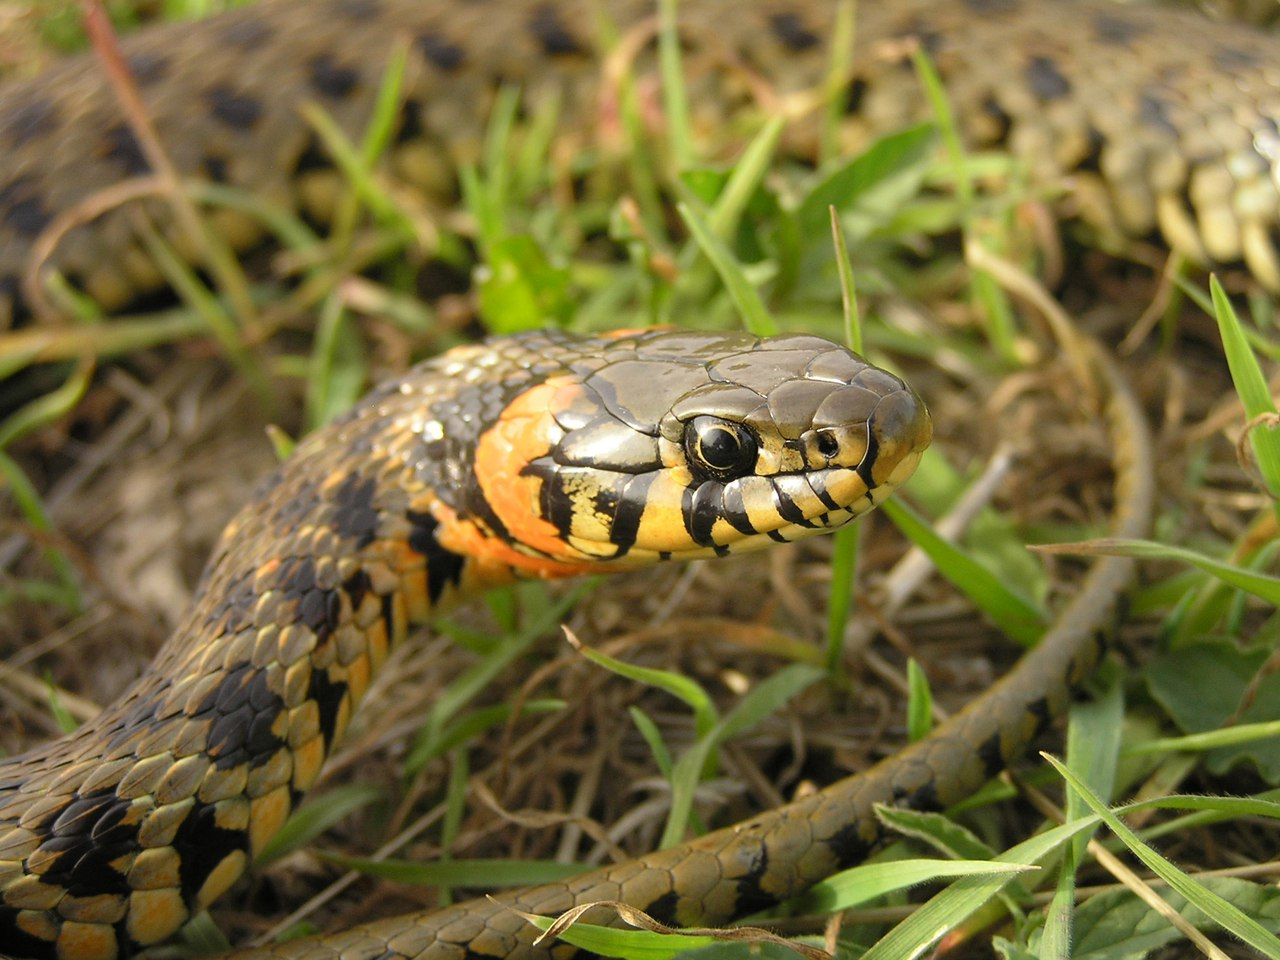 Змеи атакуют Крым